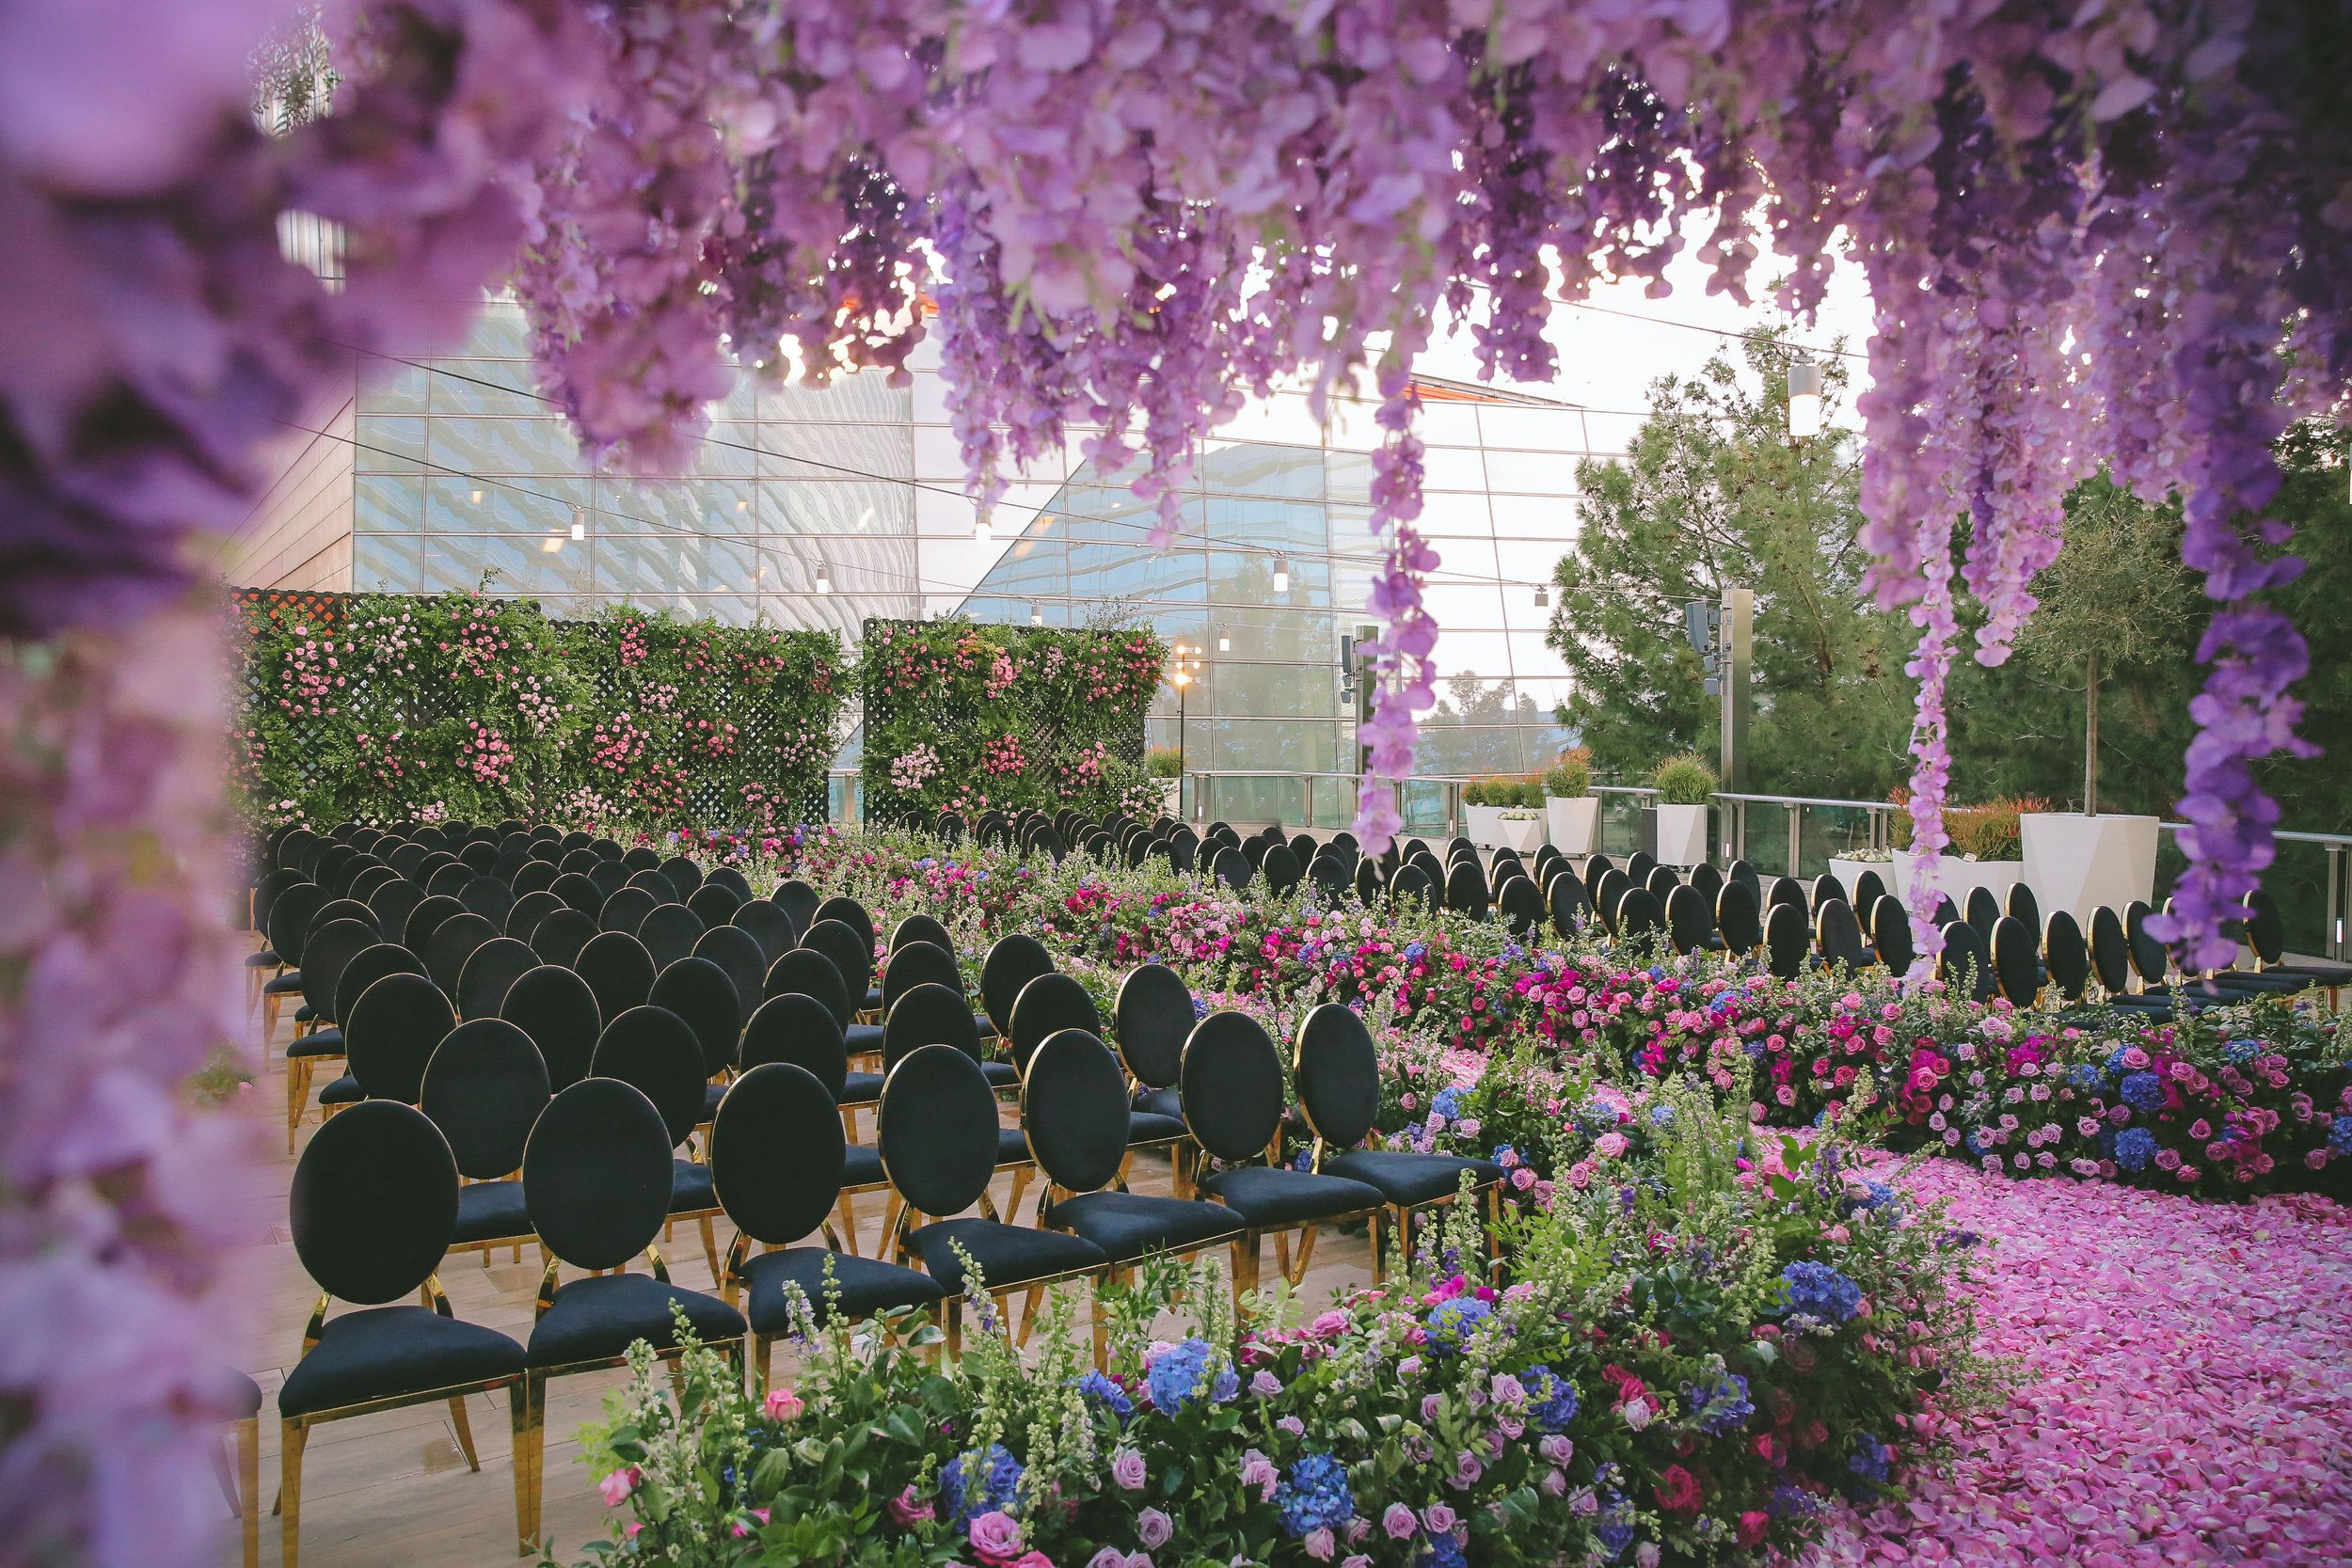 Luxury Outdoor Purple Wedding Ceremony In 2020 Las Vegas Wedding Planner Wedding Ceremony Setup Asian Inspired Wedding